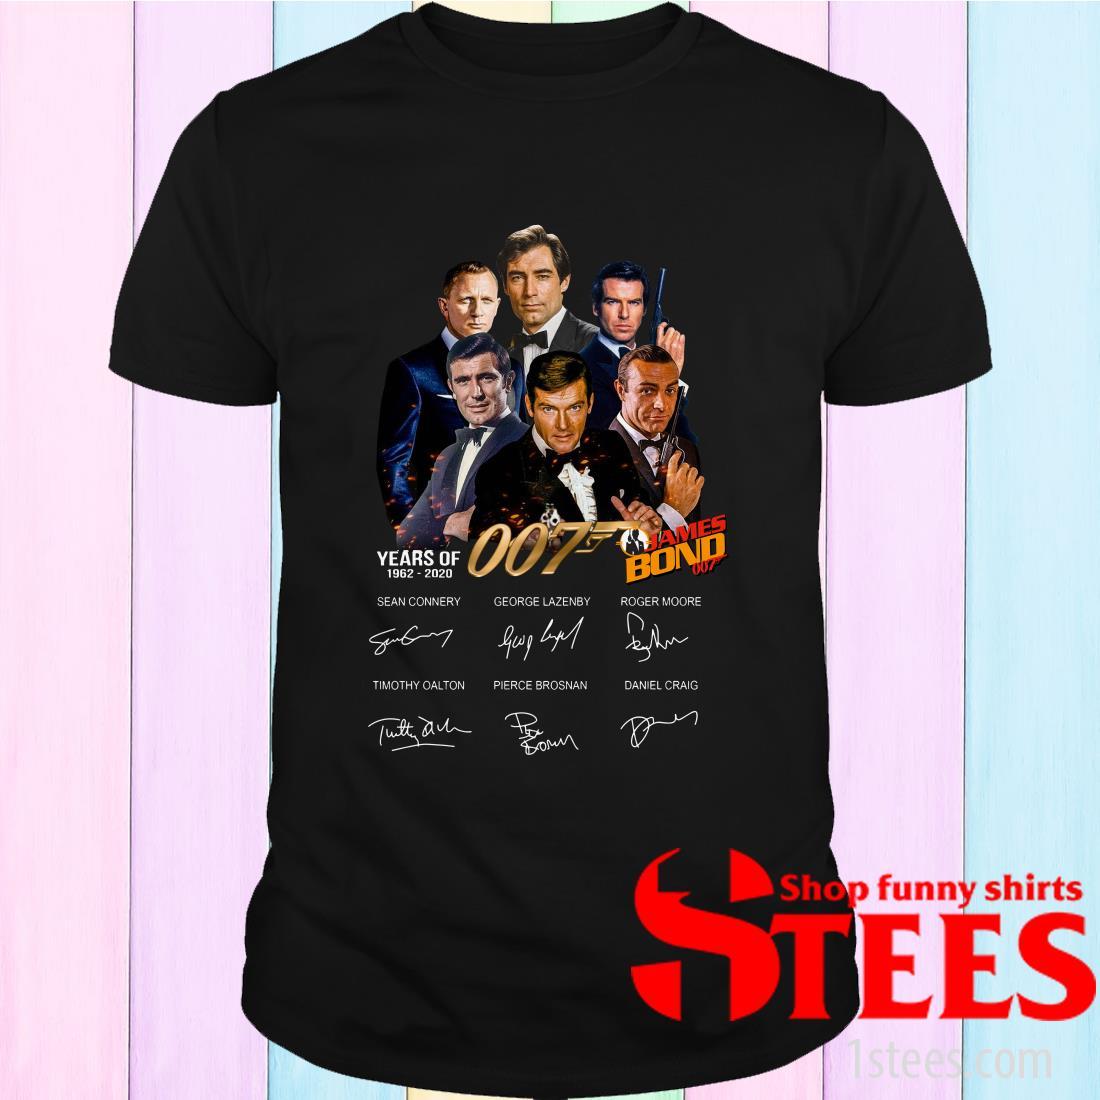 James Bond 50 Years Of 007 1962-2020 Signatures Shirt